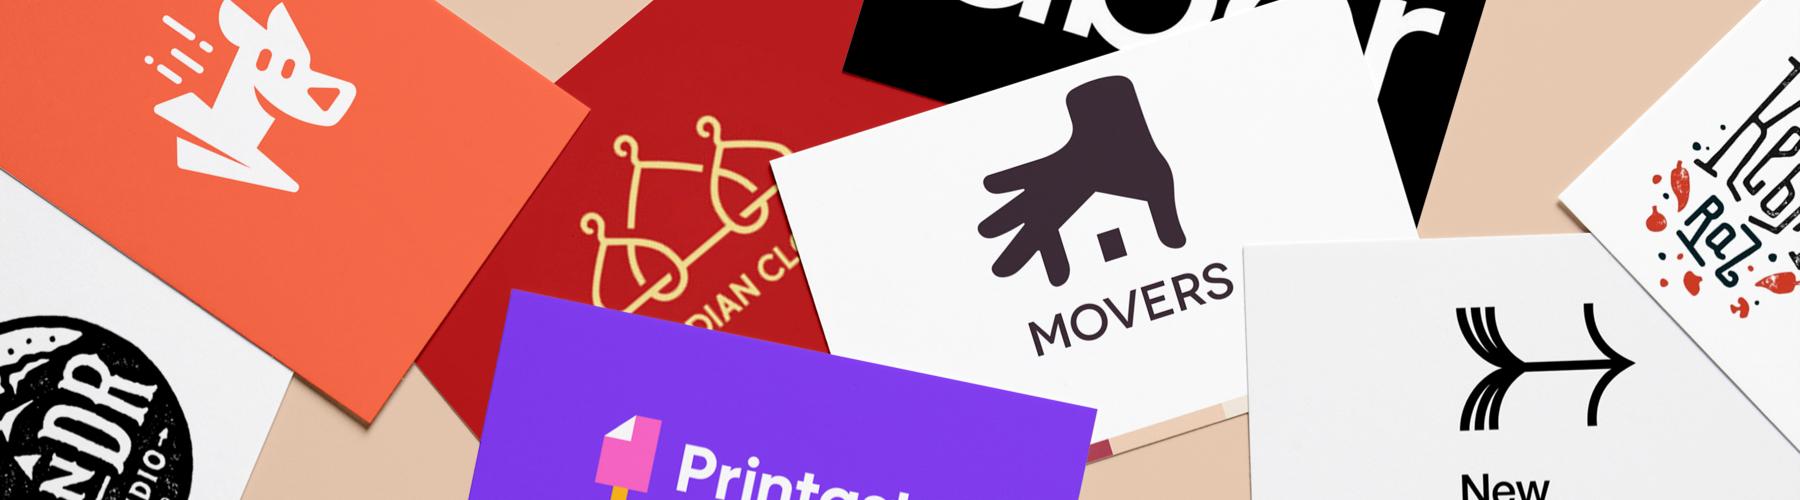 10 Logo Designs That Inspire